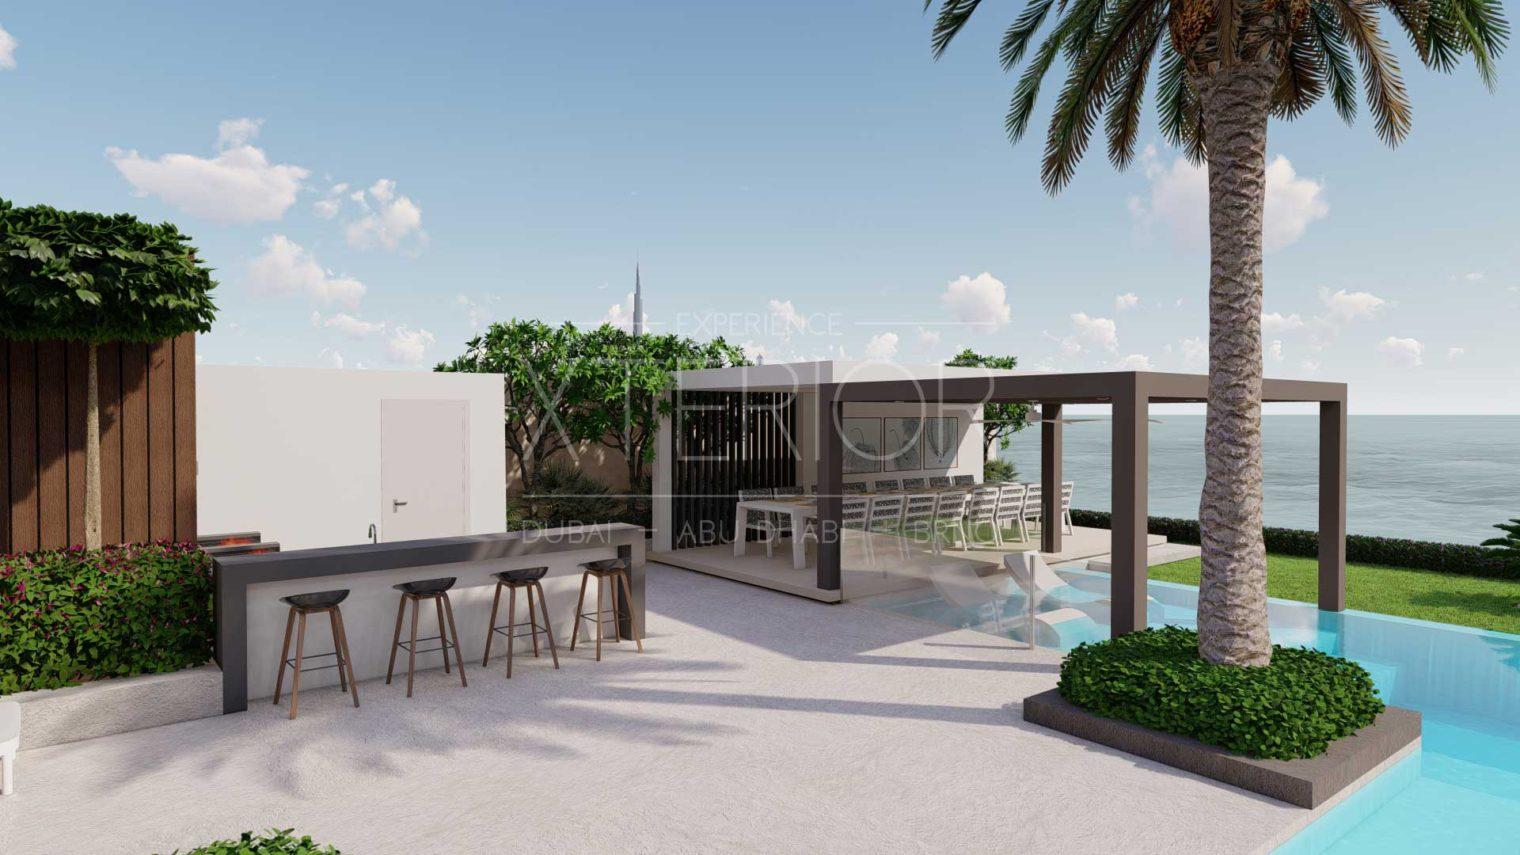 BVLGARI RESIDENCES Outdoor-Pergola-and-Barbecue-Design